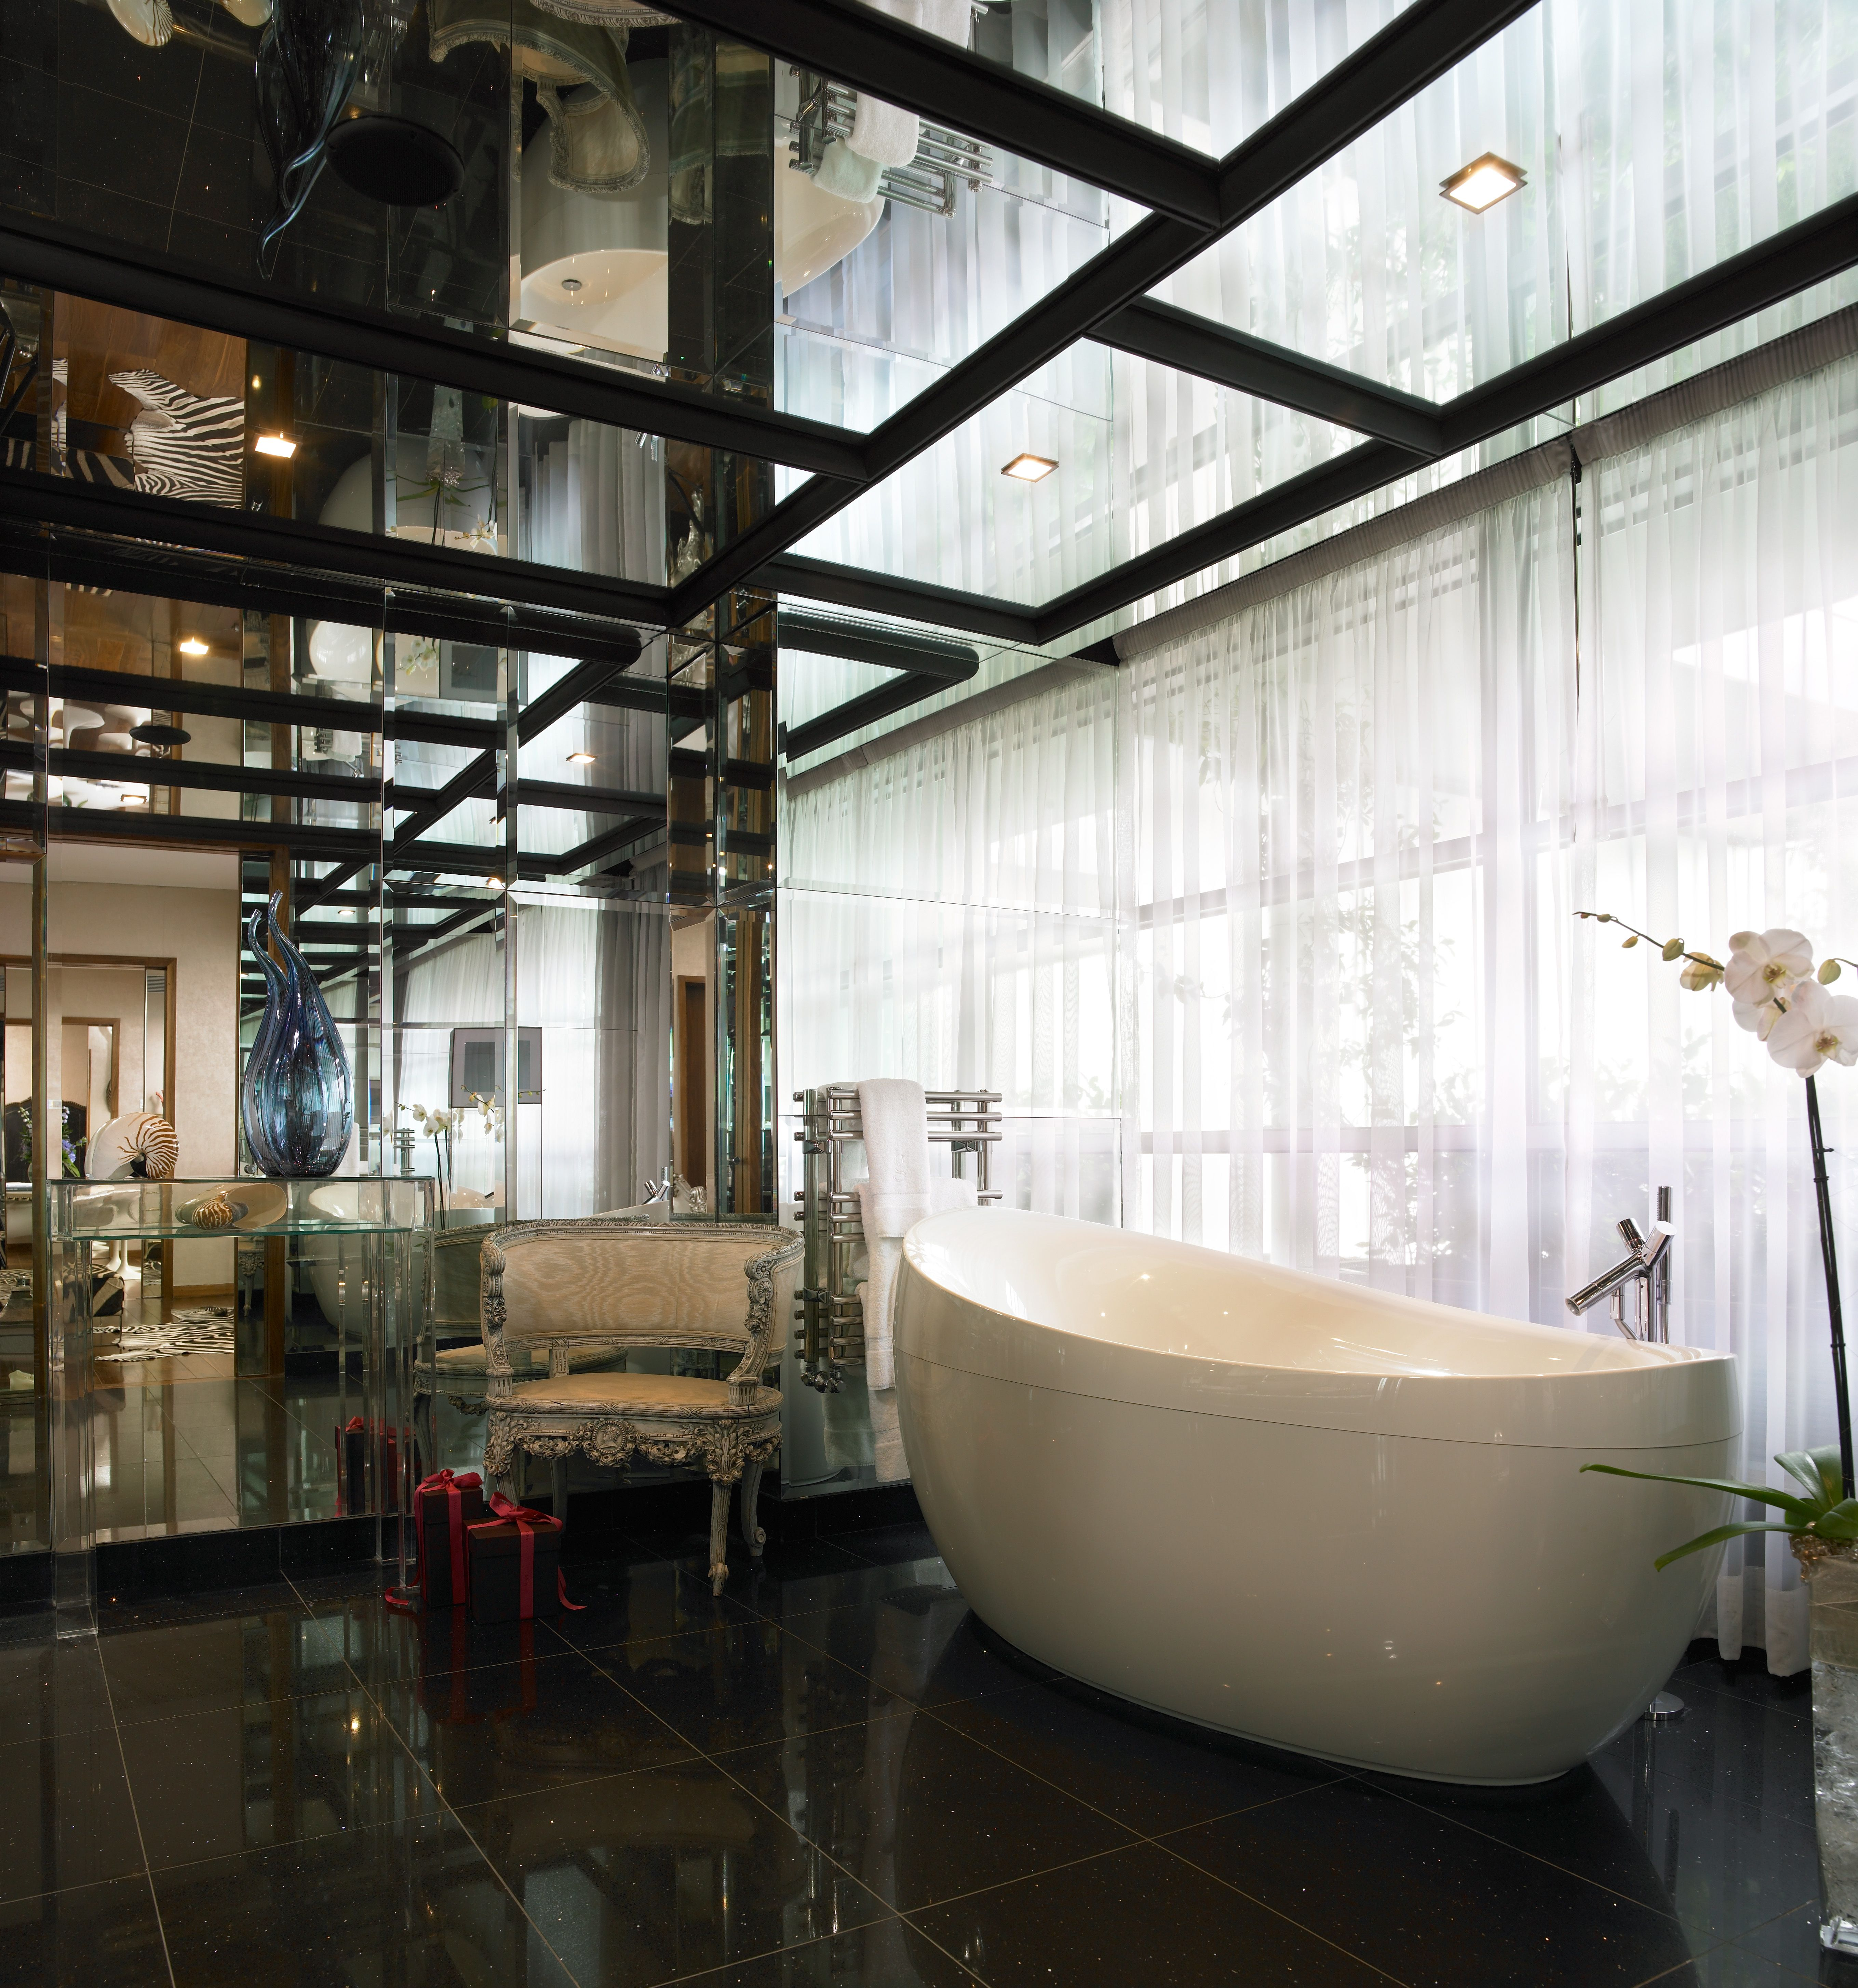 The g Hotel Galway - Linda Evangelista Suite (Penthouse) Bathroom